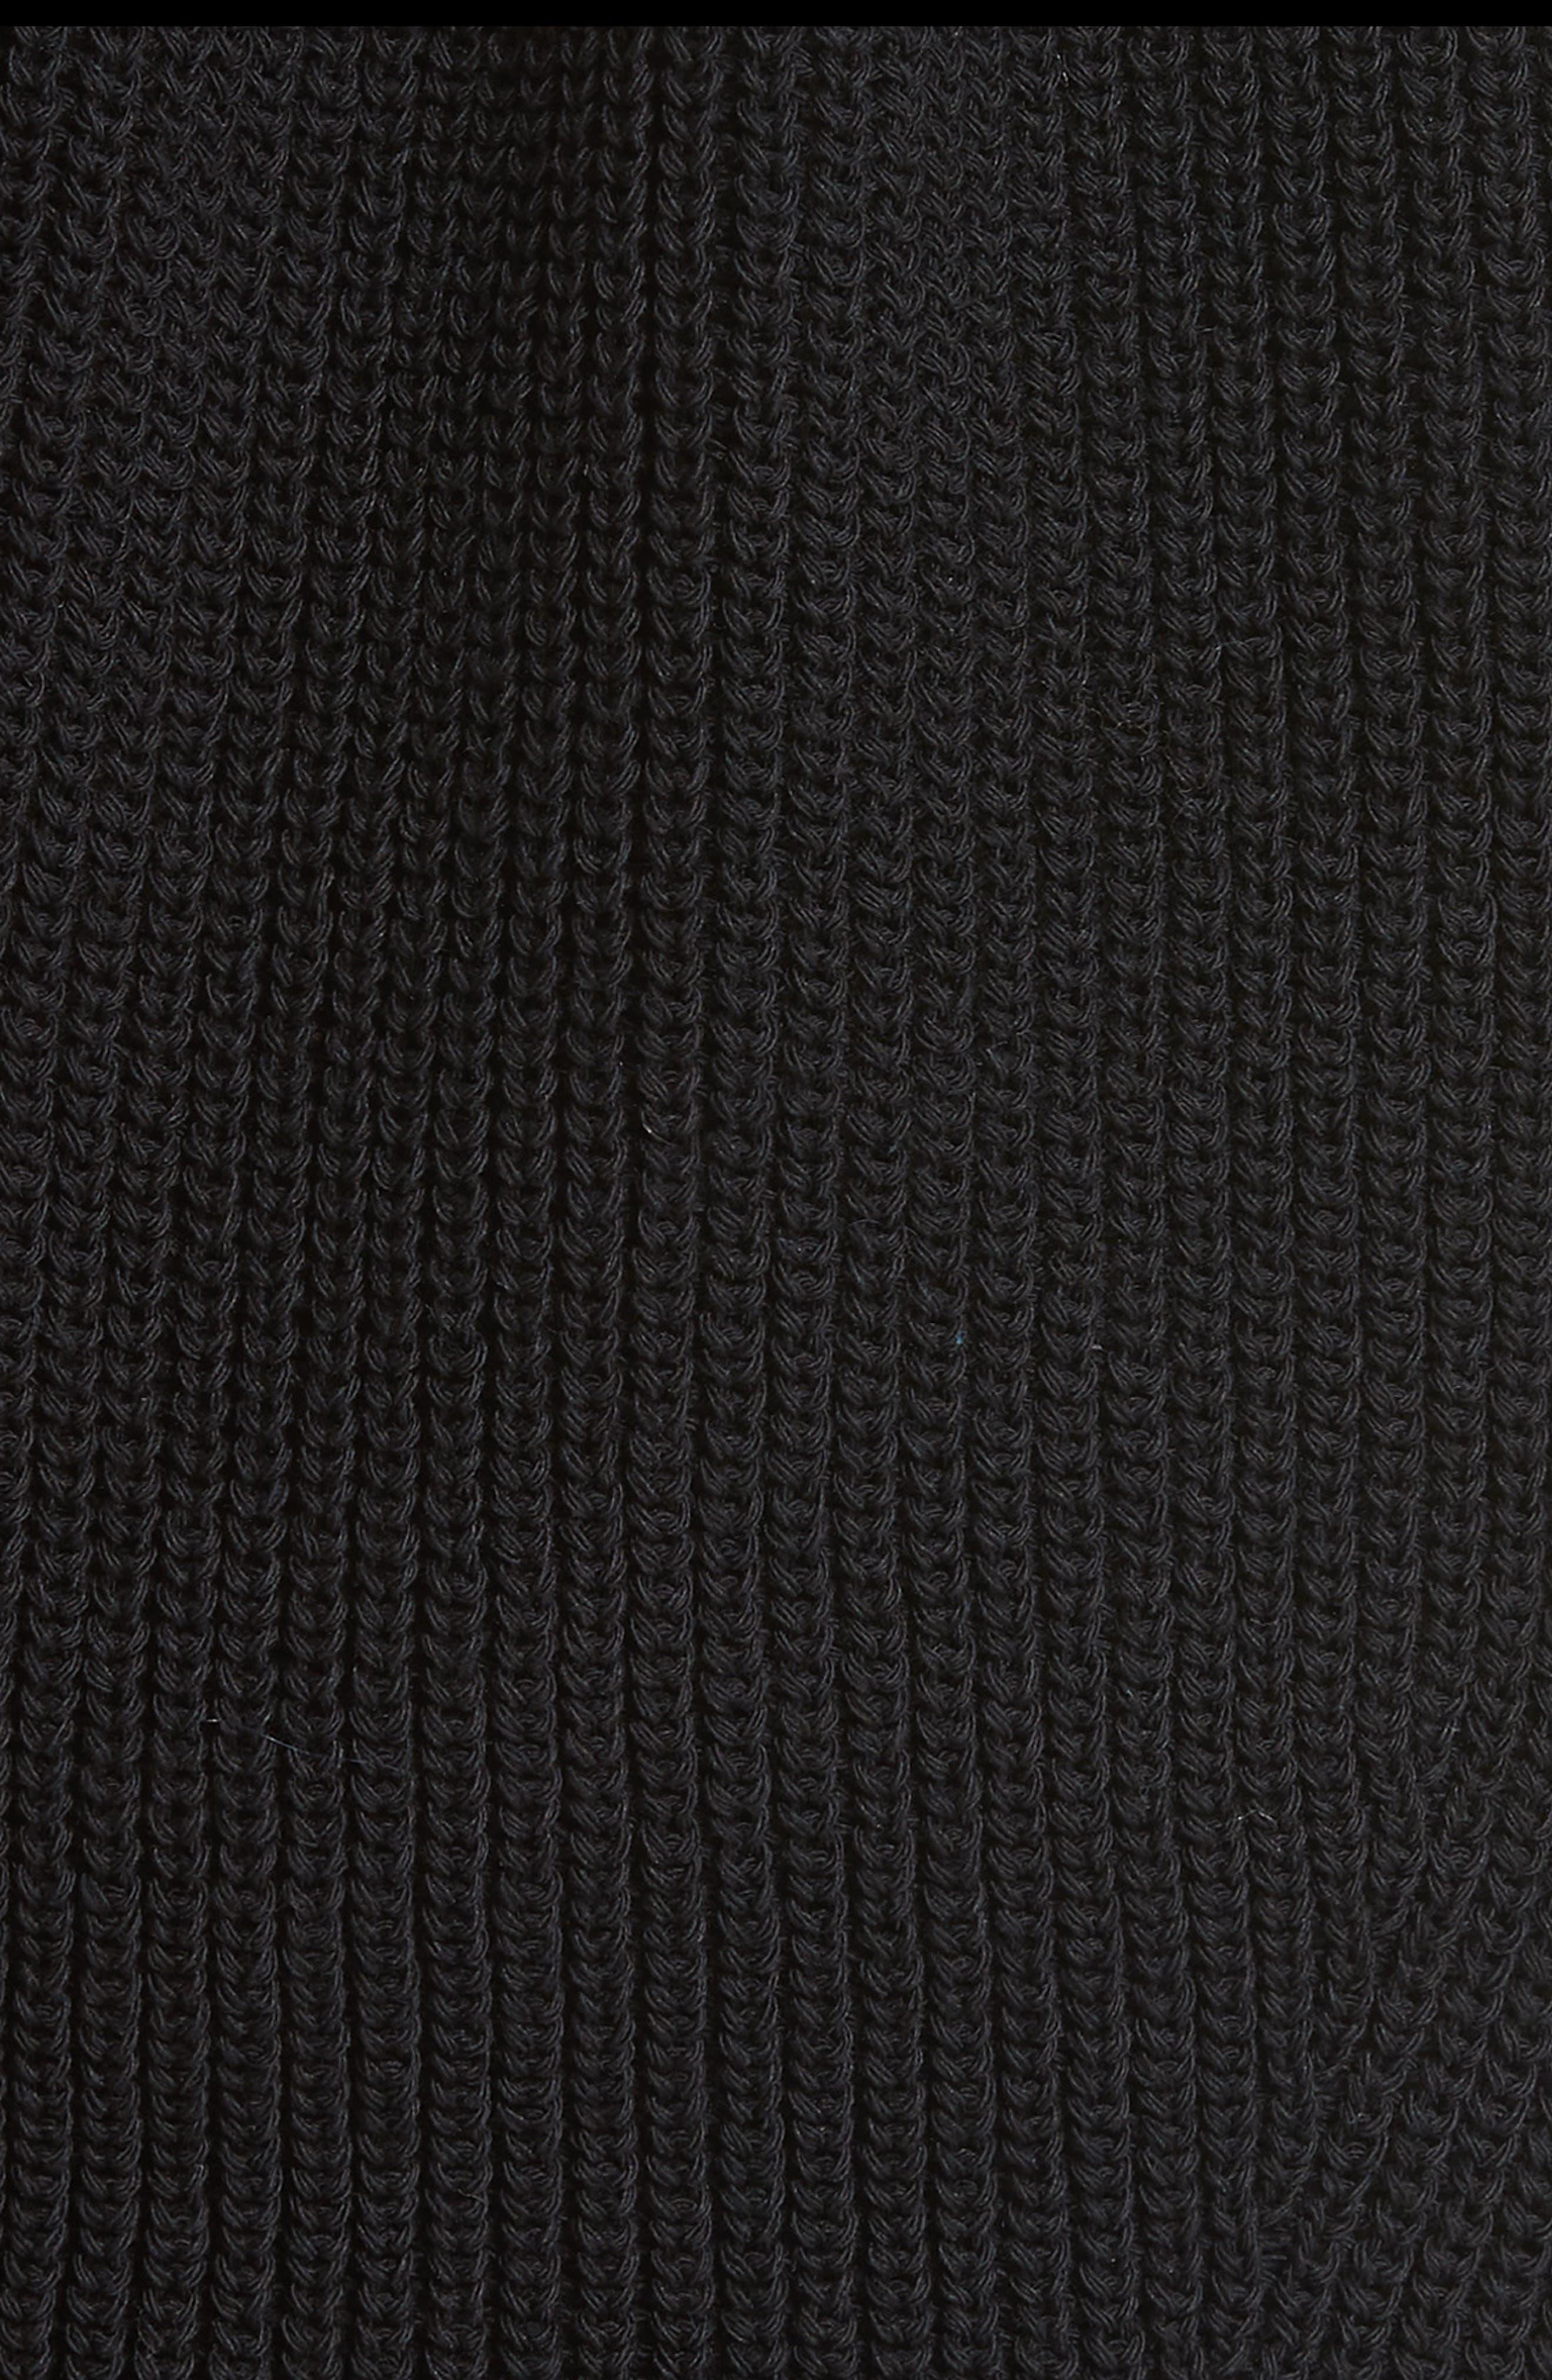 Drawstring Knit Top,                             Alternate thumbnail 5, color,                             Black